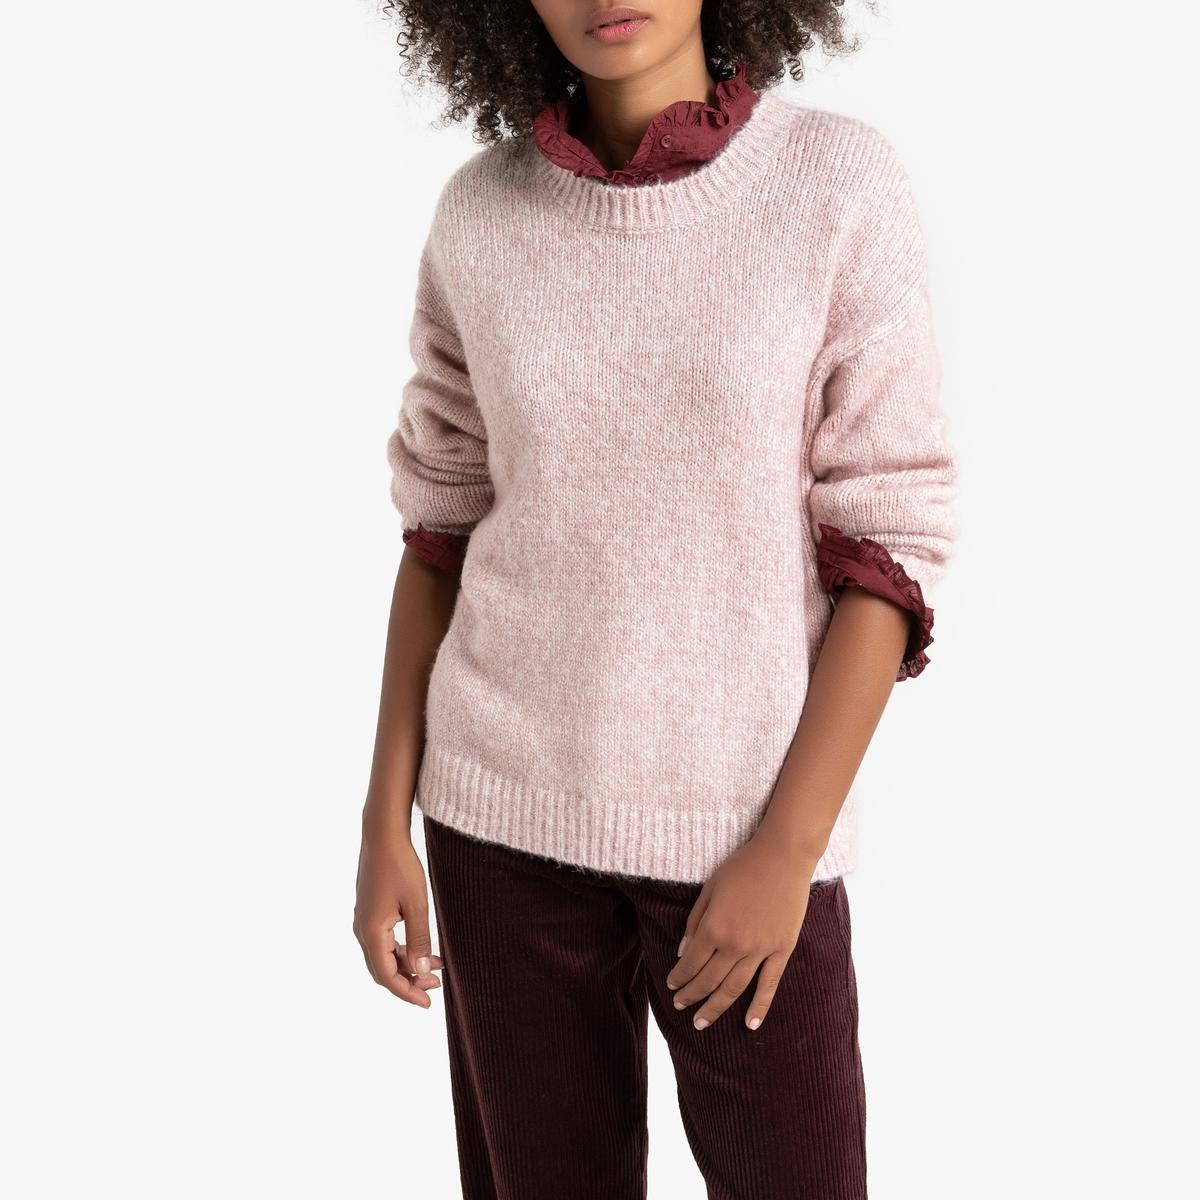 Пуловер La Redoute С круглым вырезом из плотного трикотажа мулине S розовый кардиган la redoute из трикотажа мулине s розовый